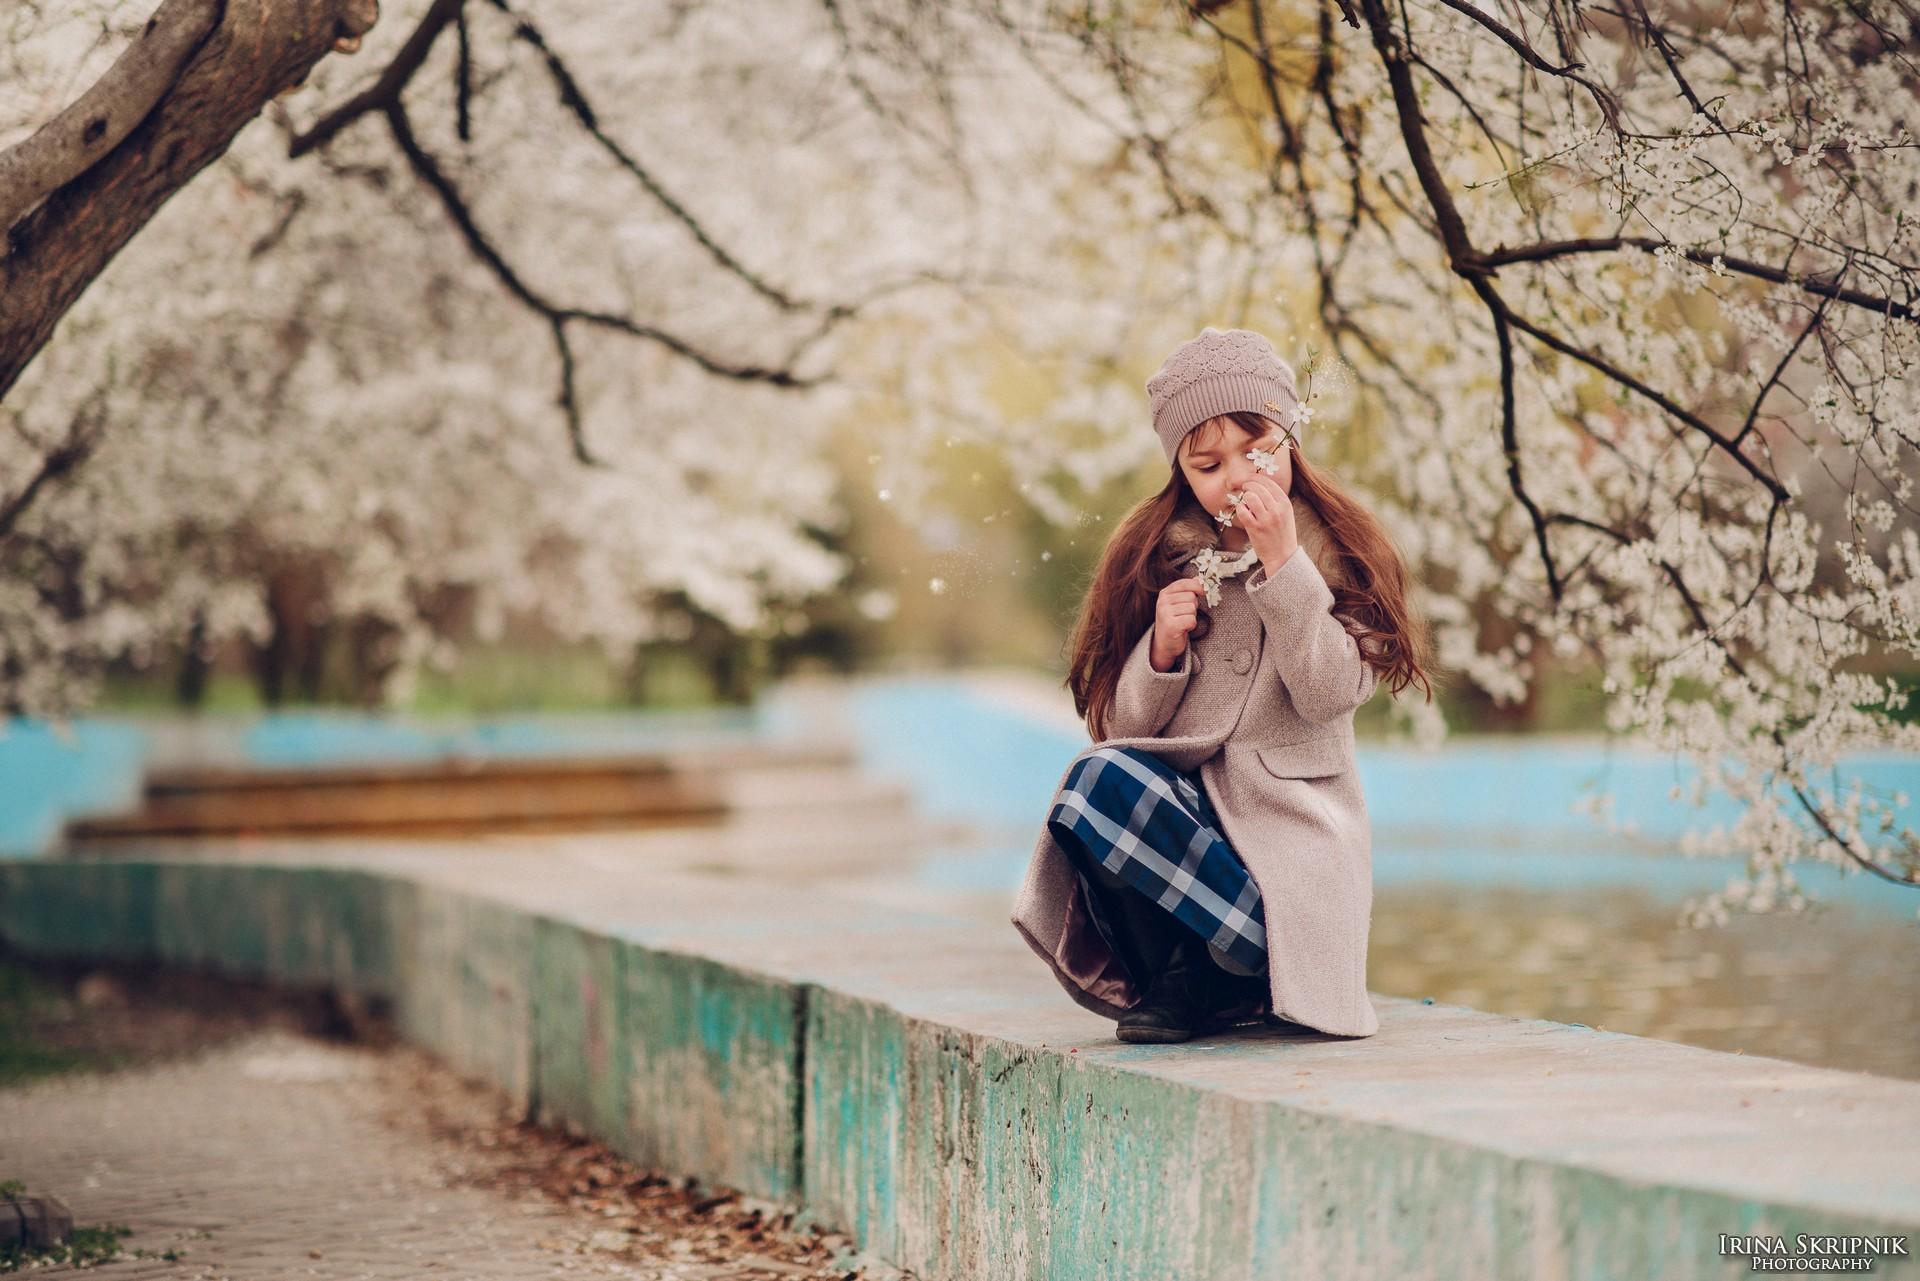 Irina Skripnik Photography 20149